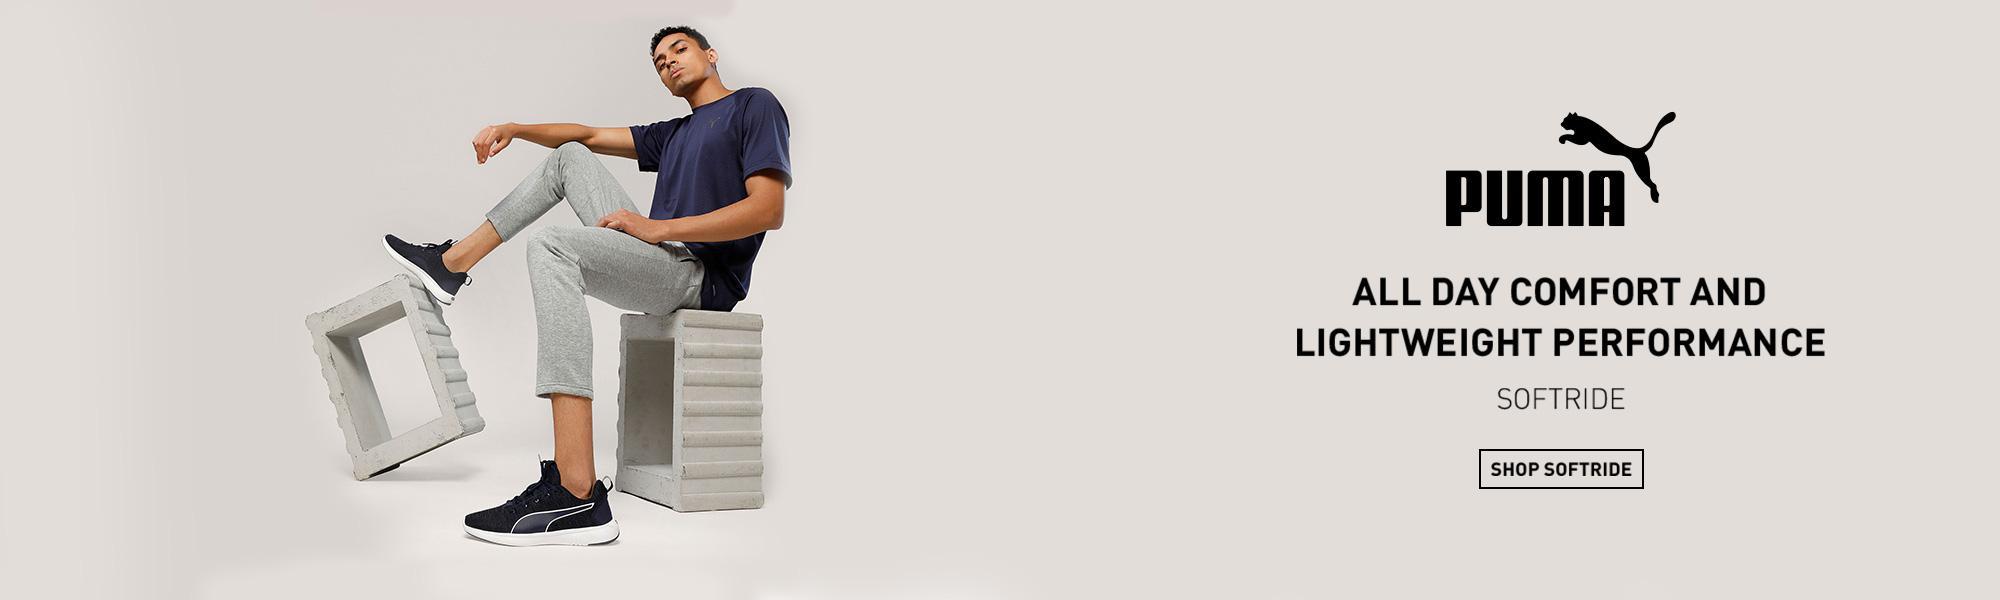 Puma-Brand-SIS-Best-Seller-Softride-Static-Web.jpg